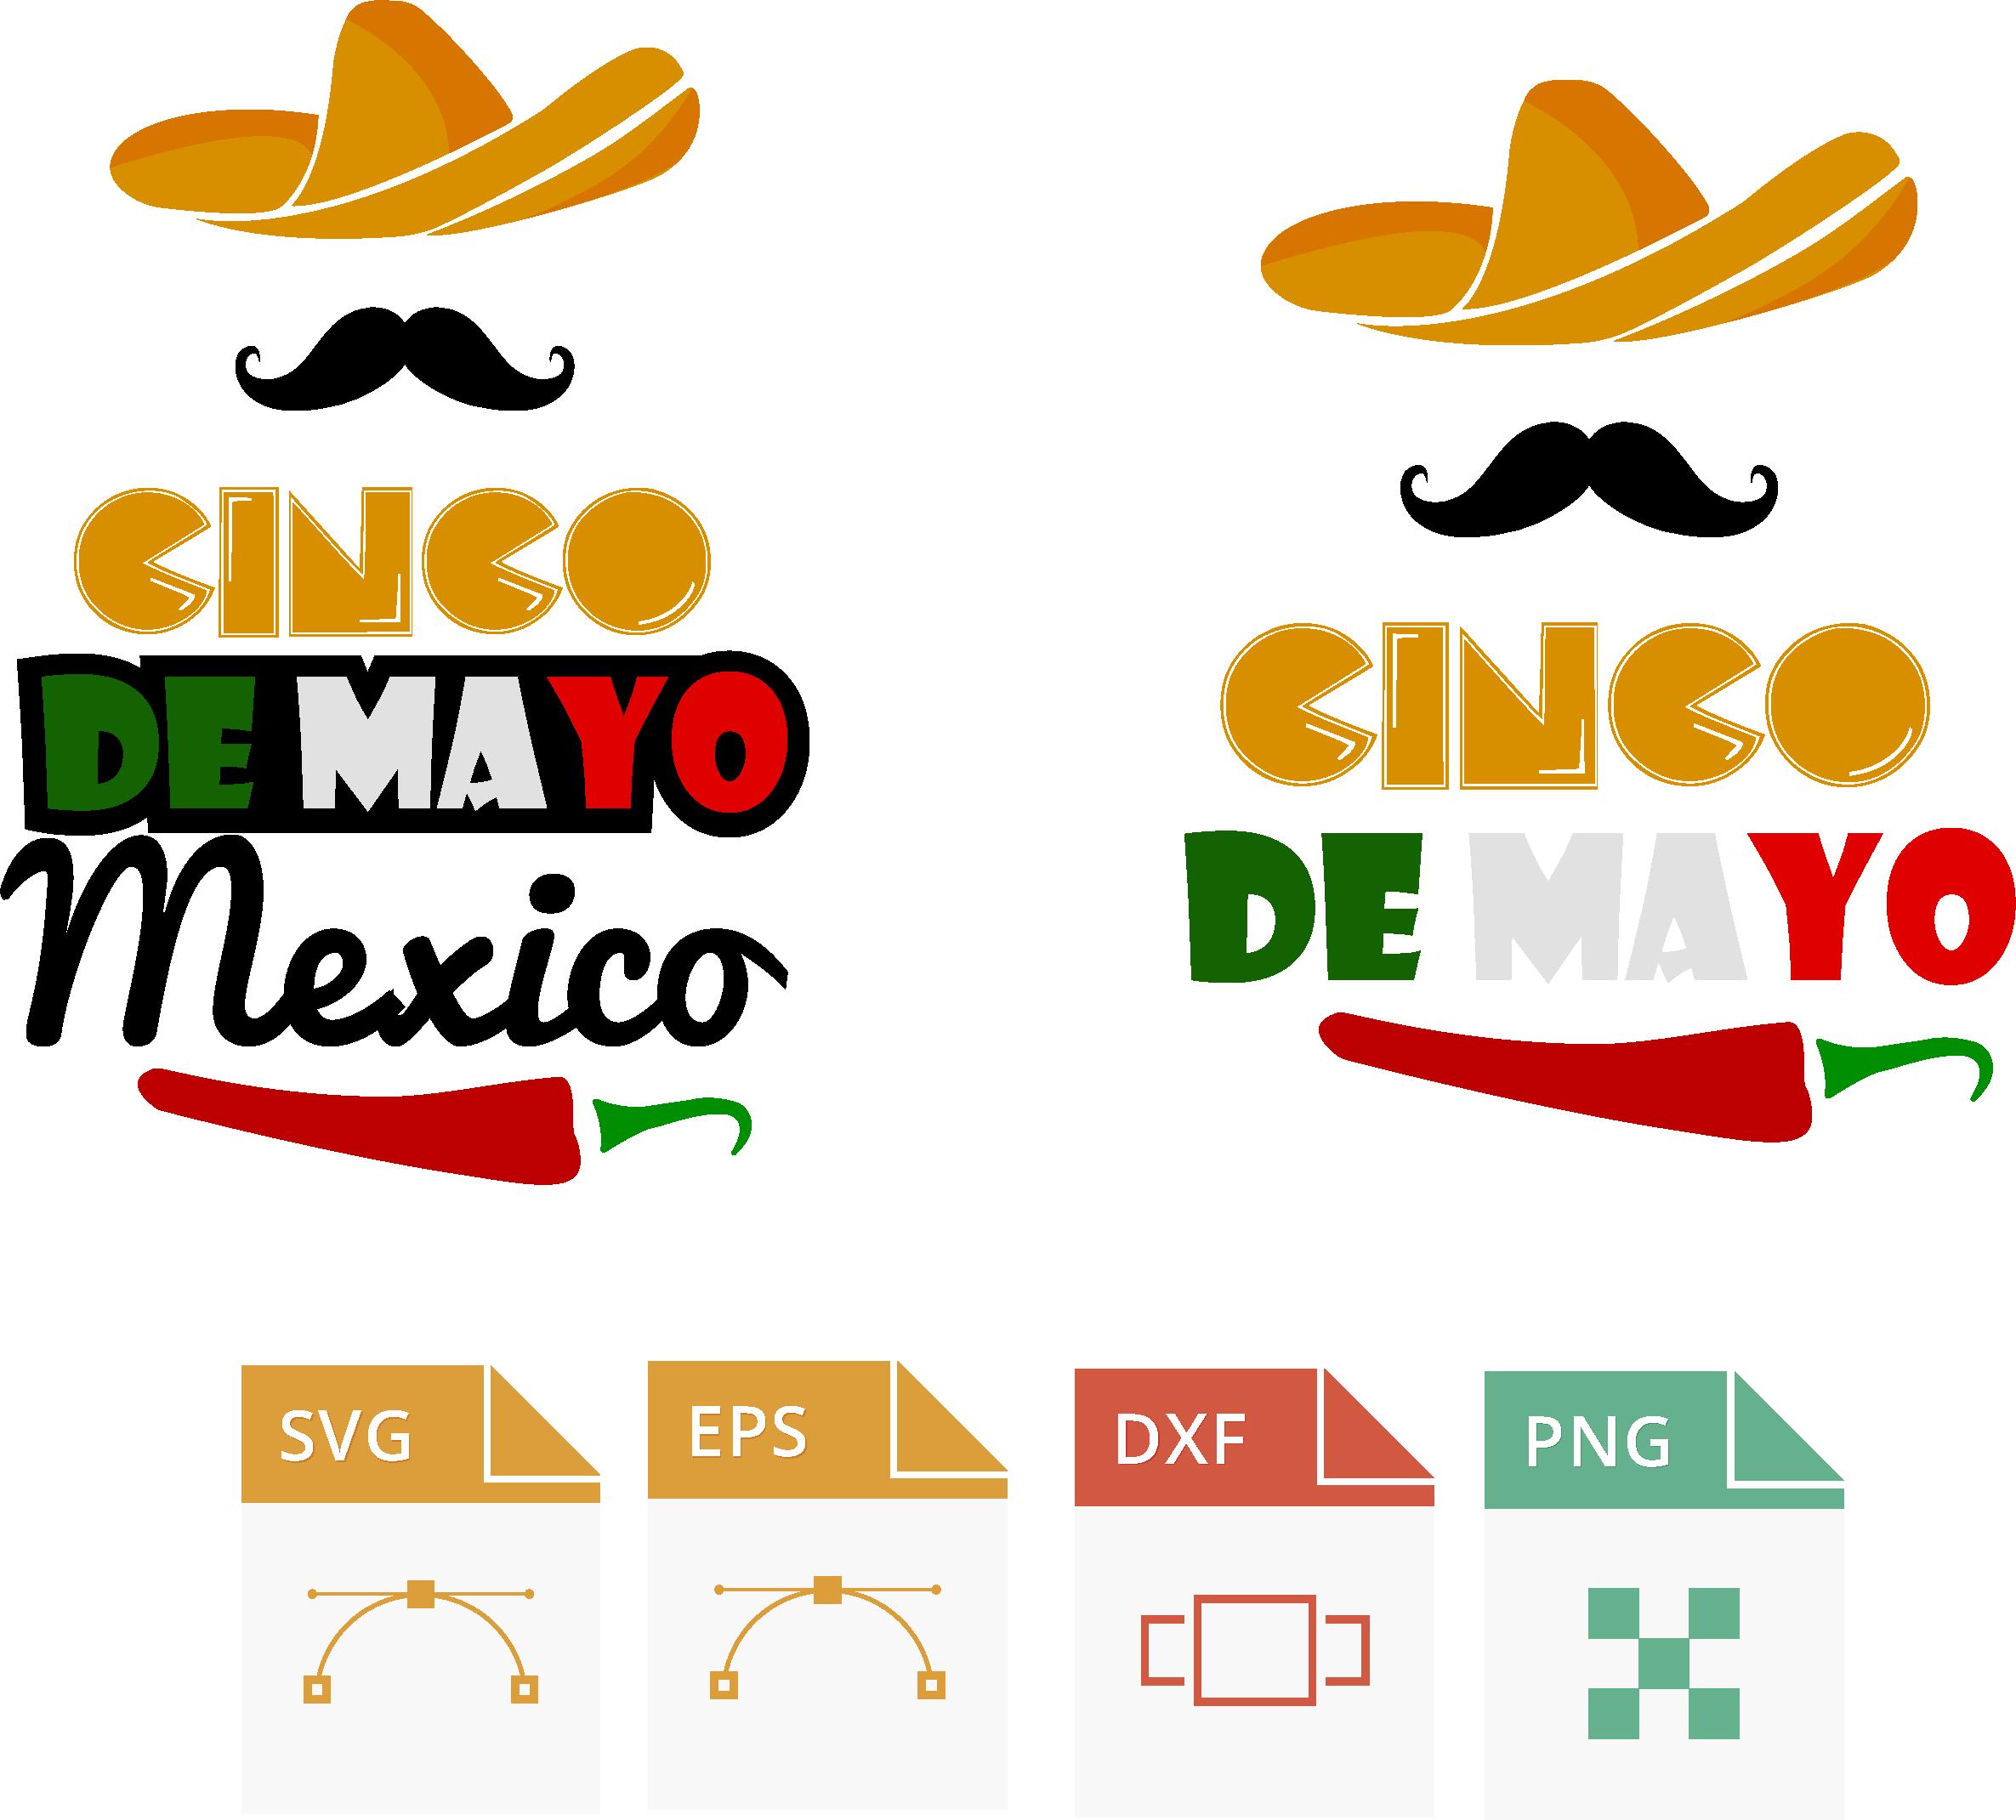 Cinco de Mayo clipart. Mexican holiday mariachi dancers, musicians,  maracas, planner stickers, fiesta, commercial use.